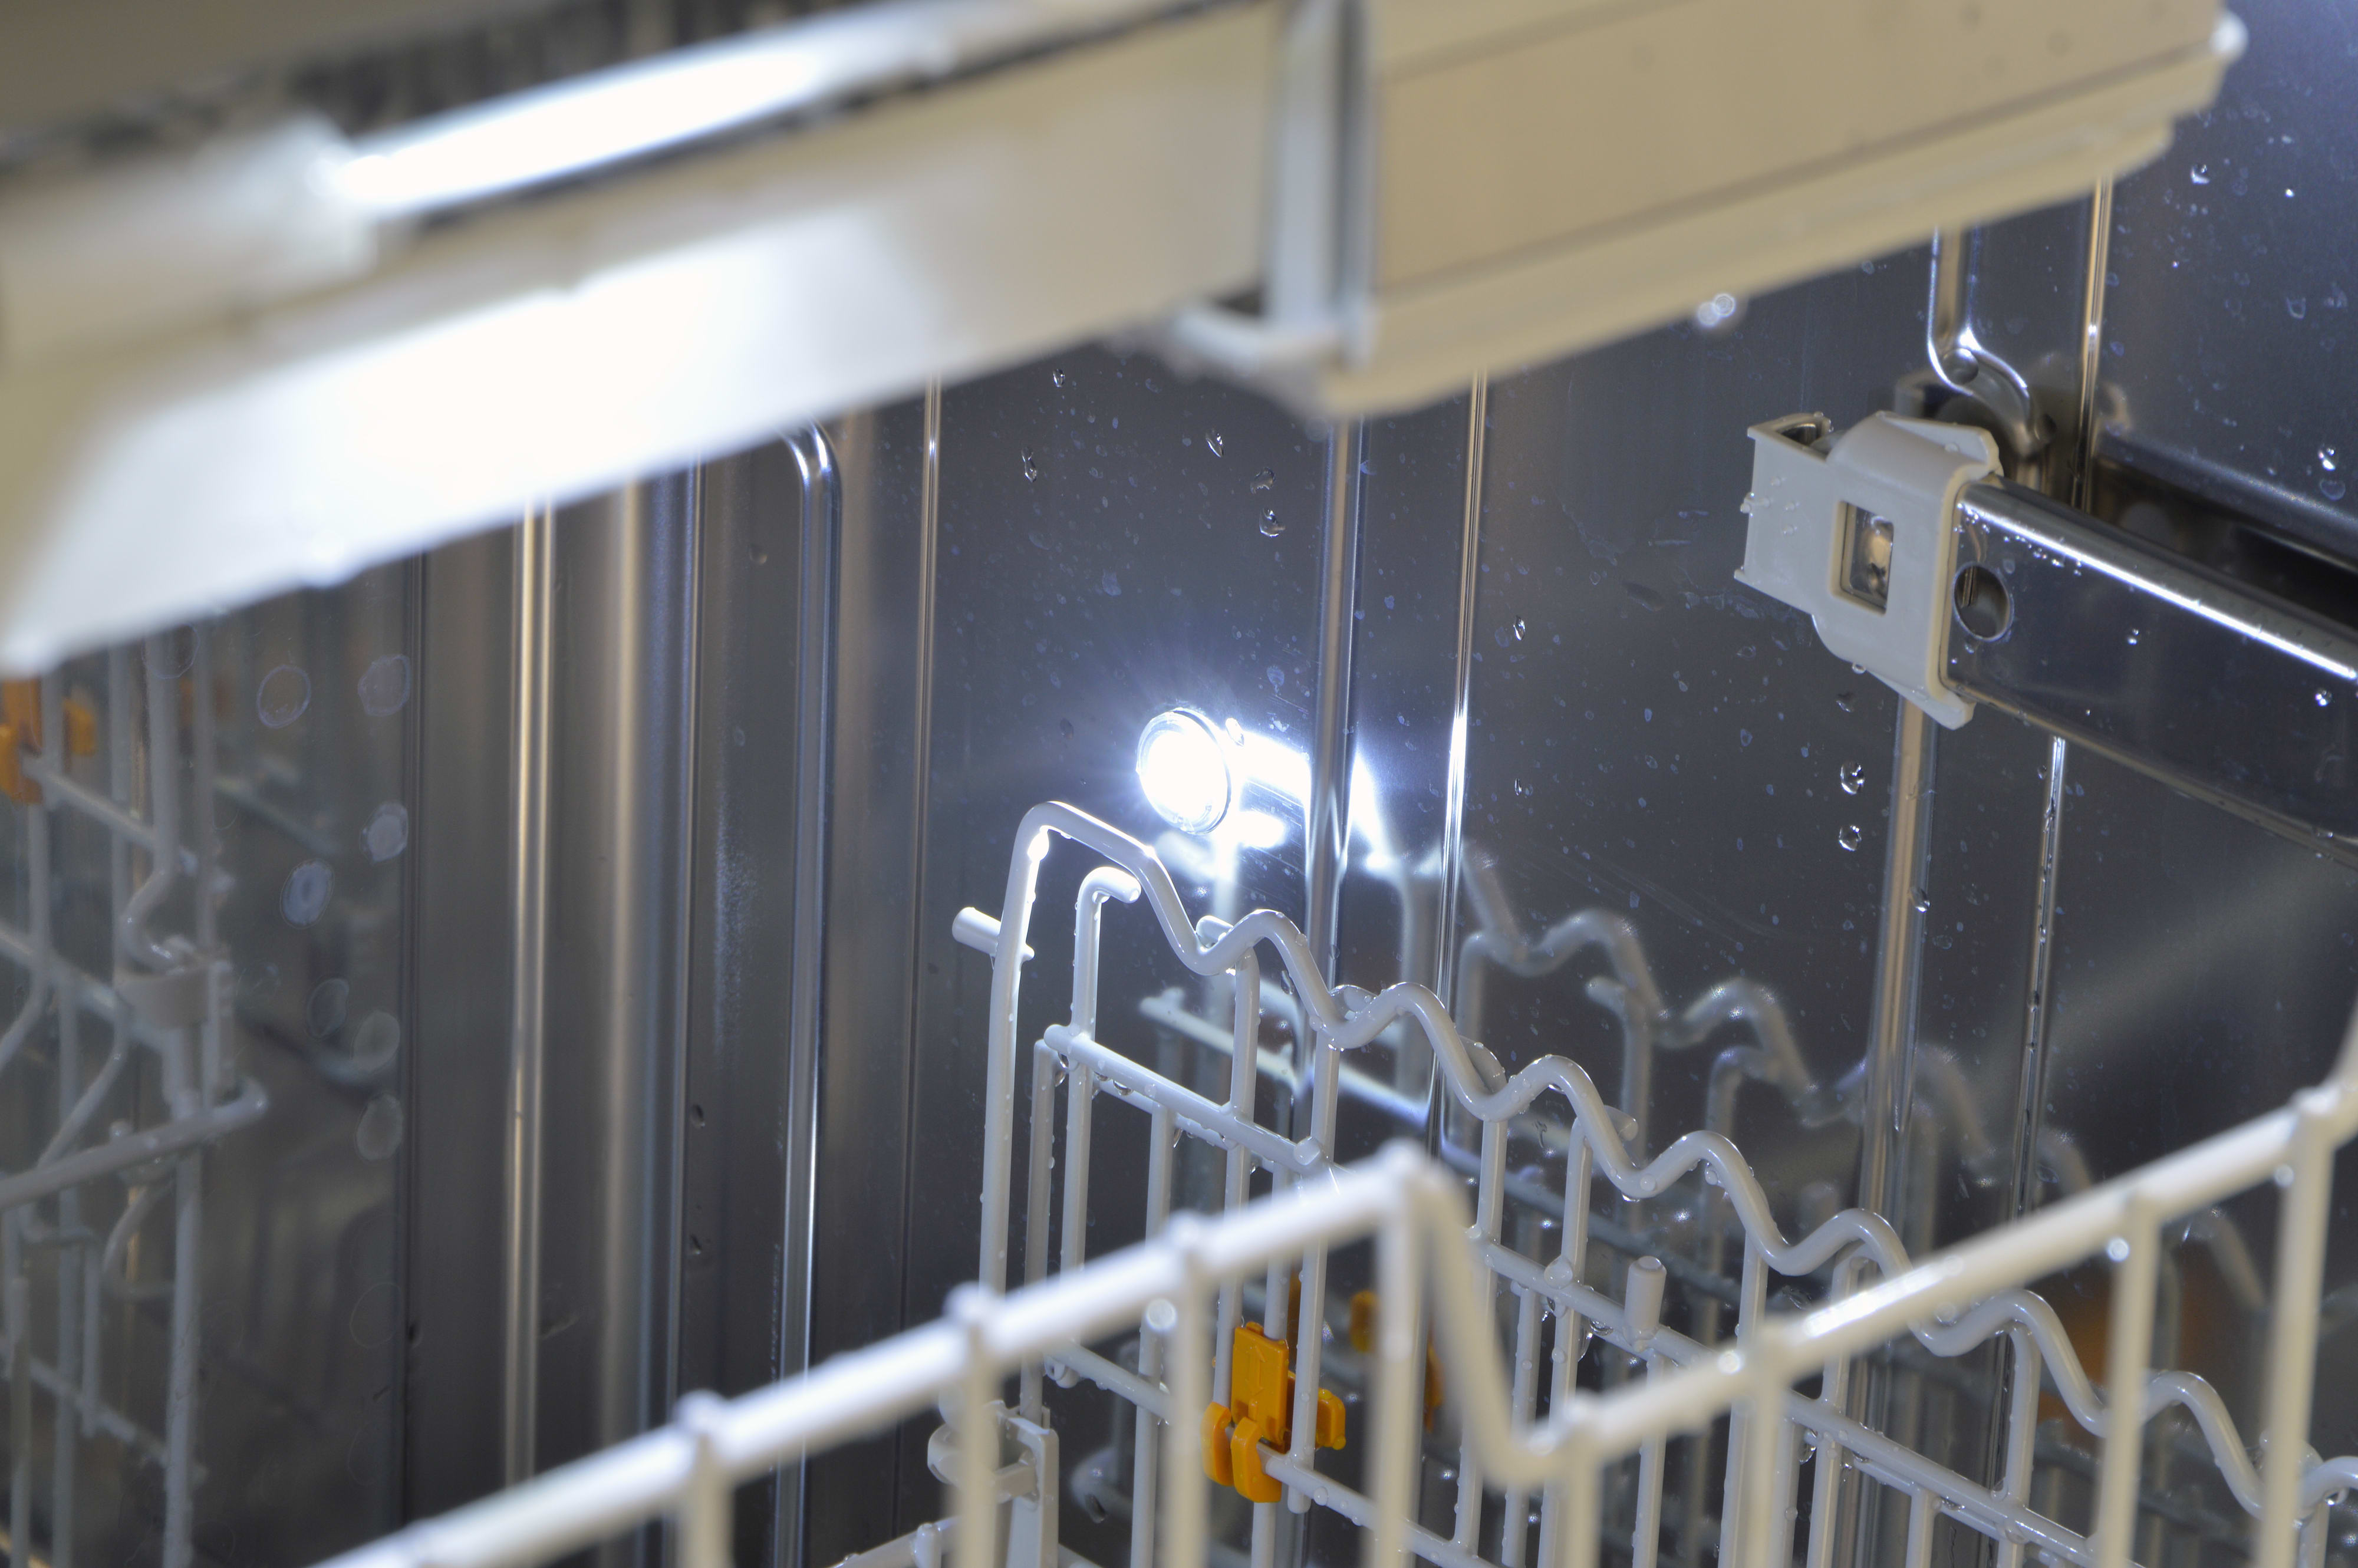 Closeup of an internal light deep inside the dishwasher's tub